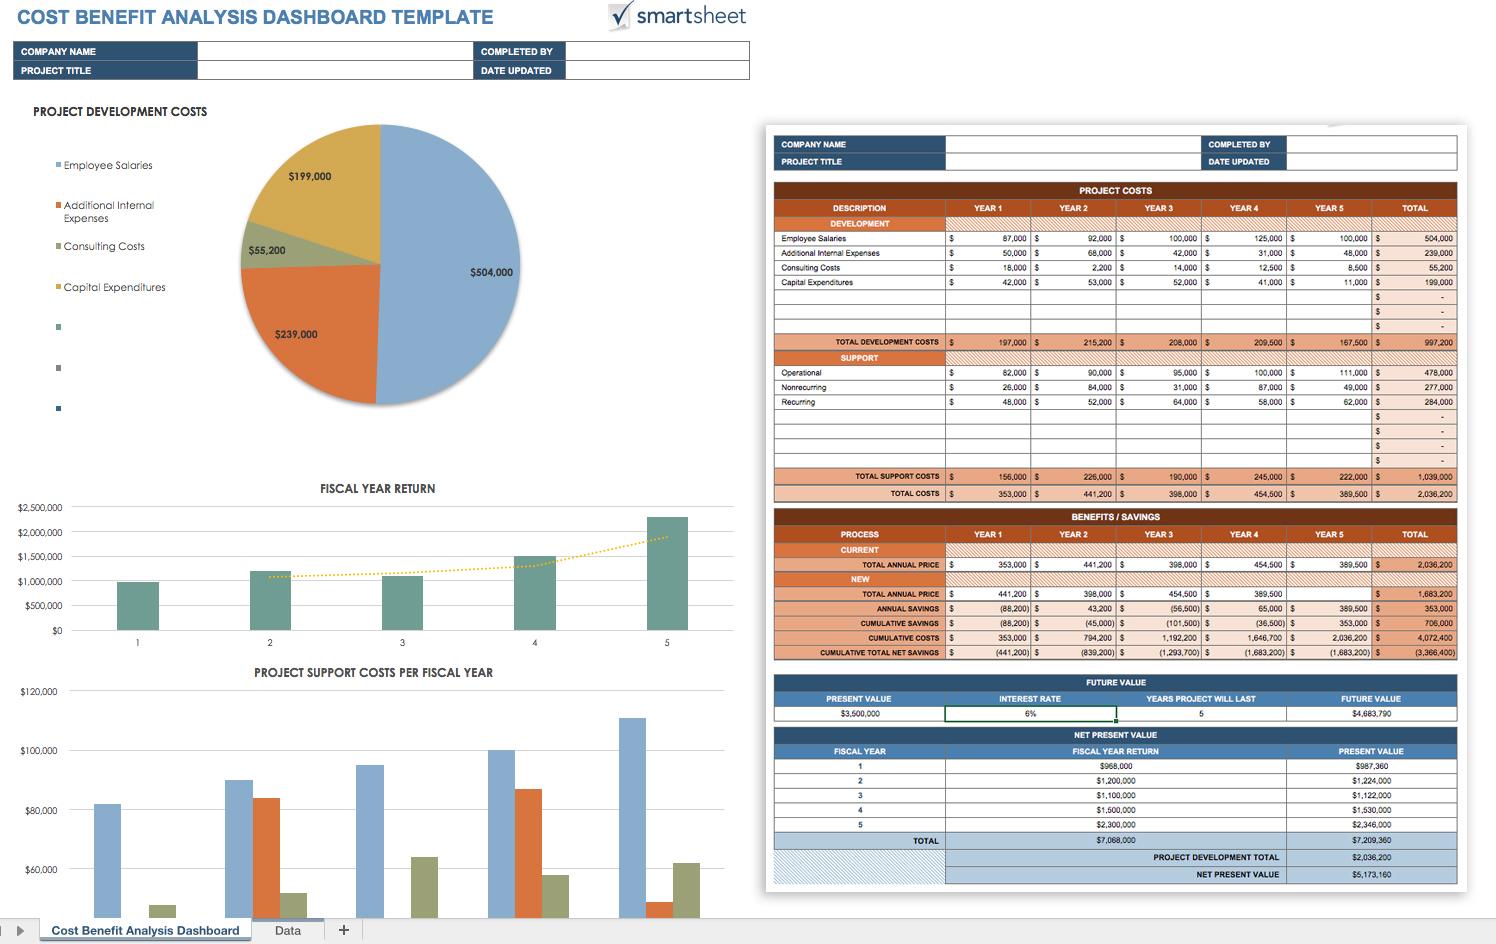 Cost Analysis Spreadsheet Regarding Free Cost Benefit Analysis Templates Smartsheet Within Cost Analysis